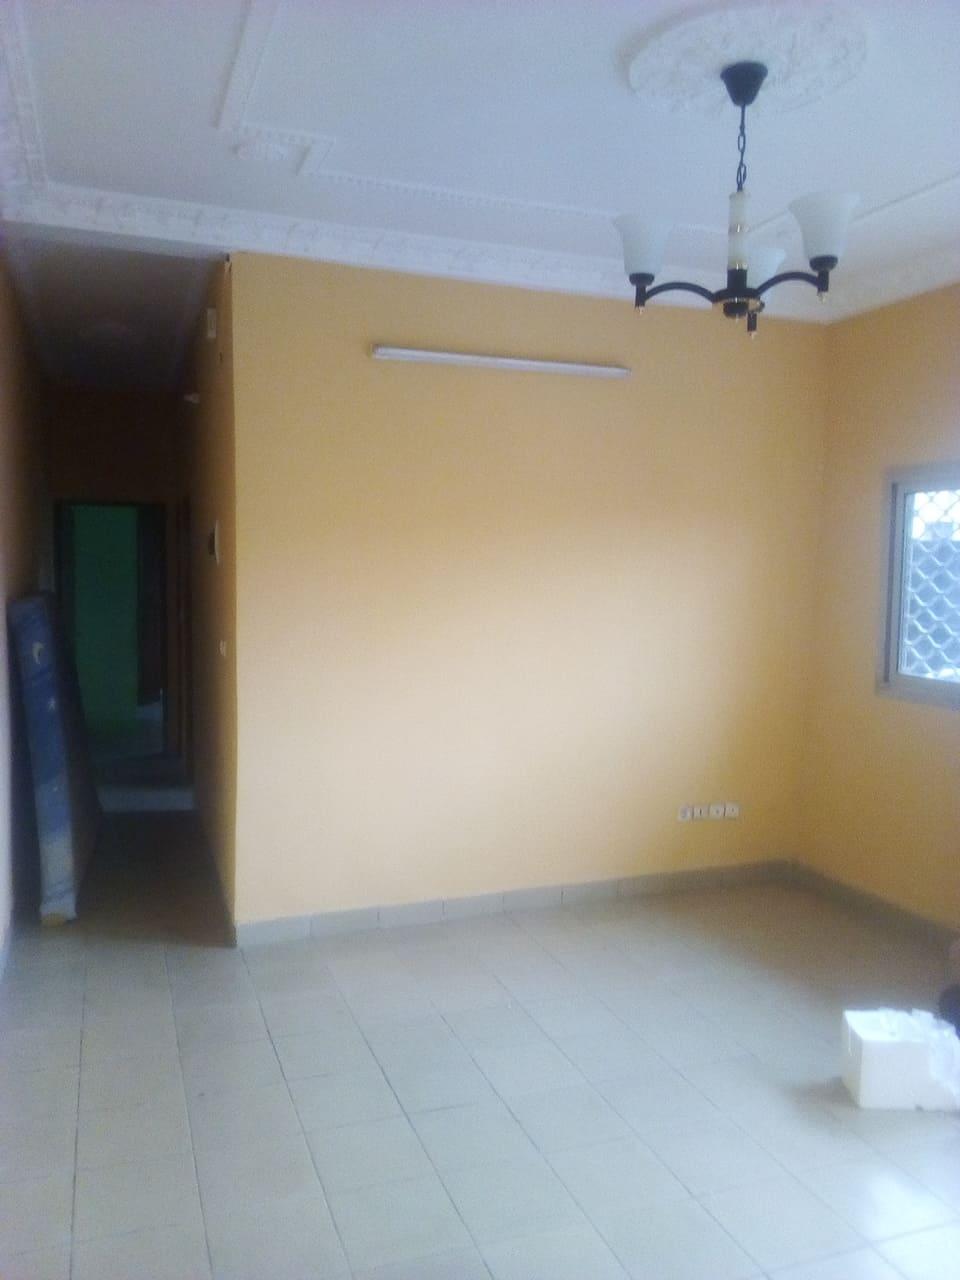 Apartment to rent - Yaoundé, Emana, pas loin du pont - 1 living room(s), 1 bedroom(s), 1 bathroom(s) - 100 000 FCFA / month